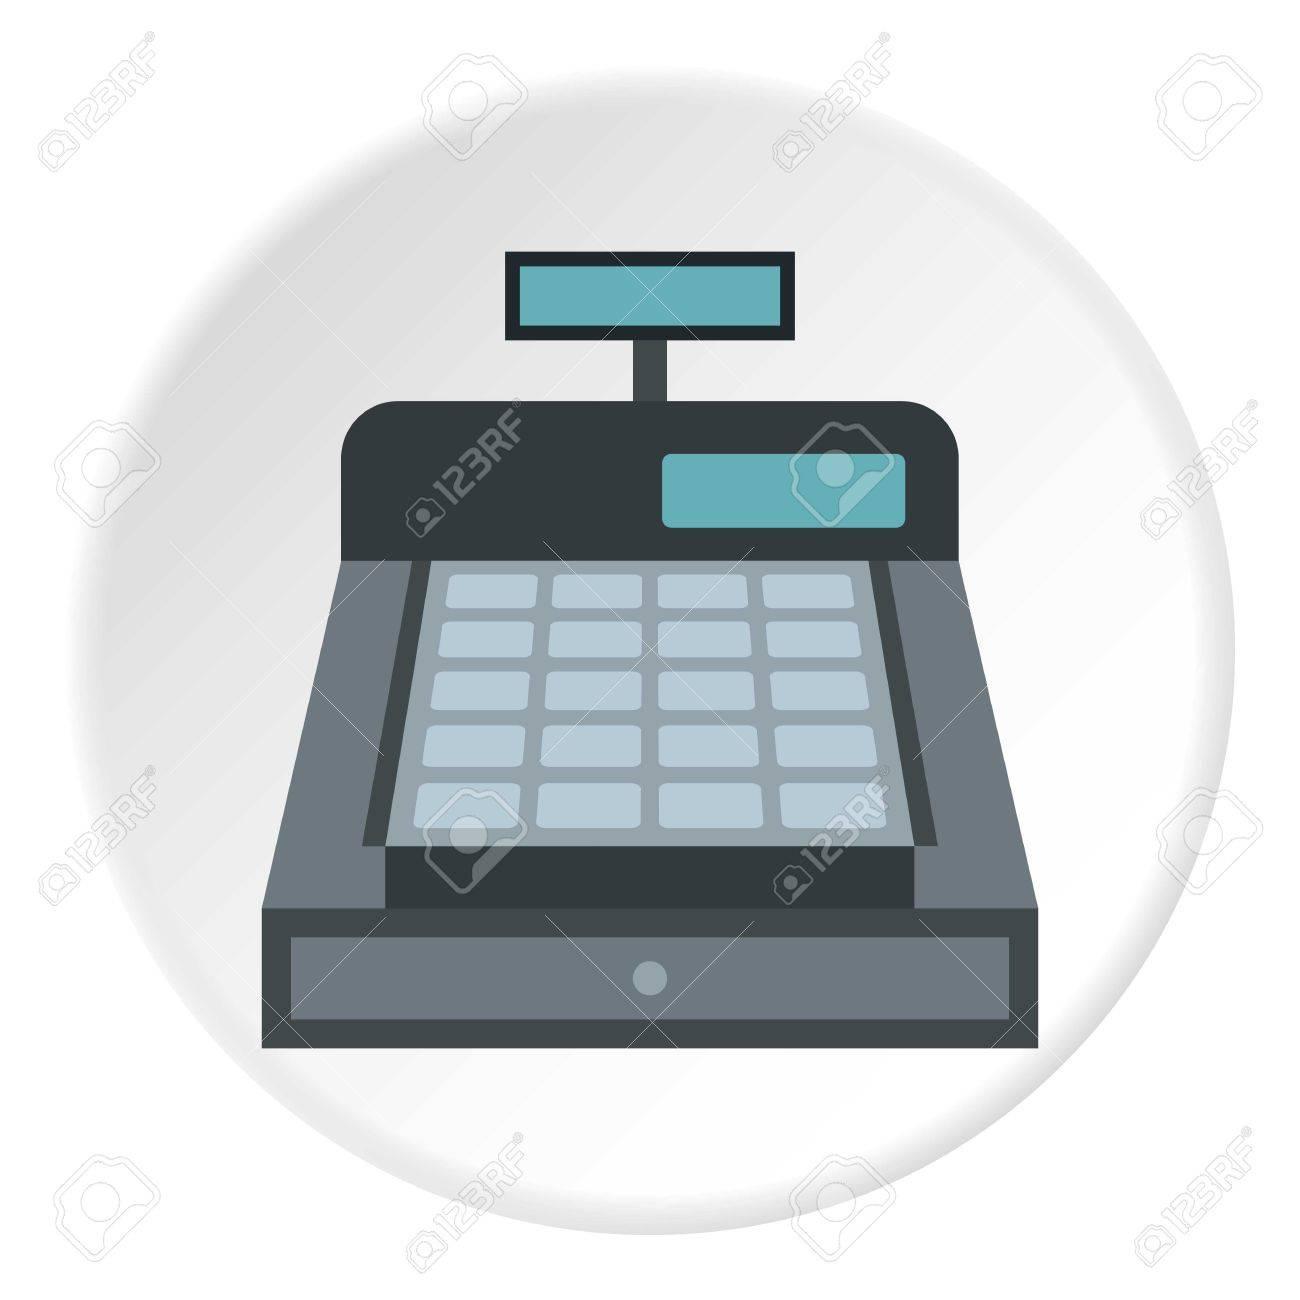 Cash register icon. Flat illustration of cash register vector icon for web design - 64095955